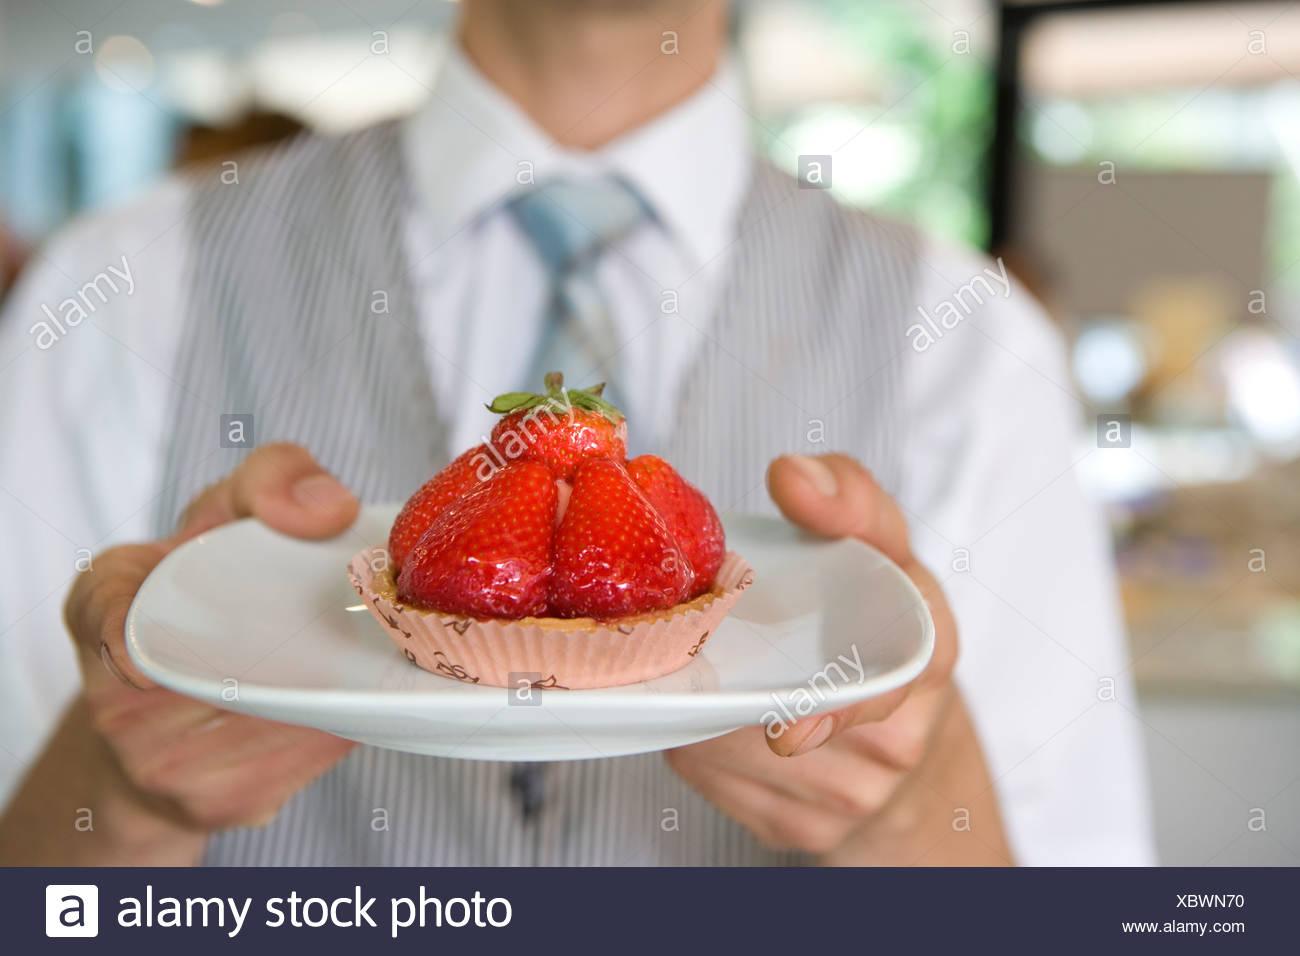 Waiter with strawberry tart, close-up of tart - Stock Image